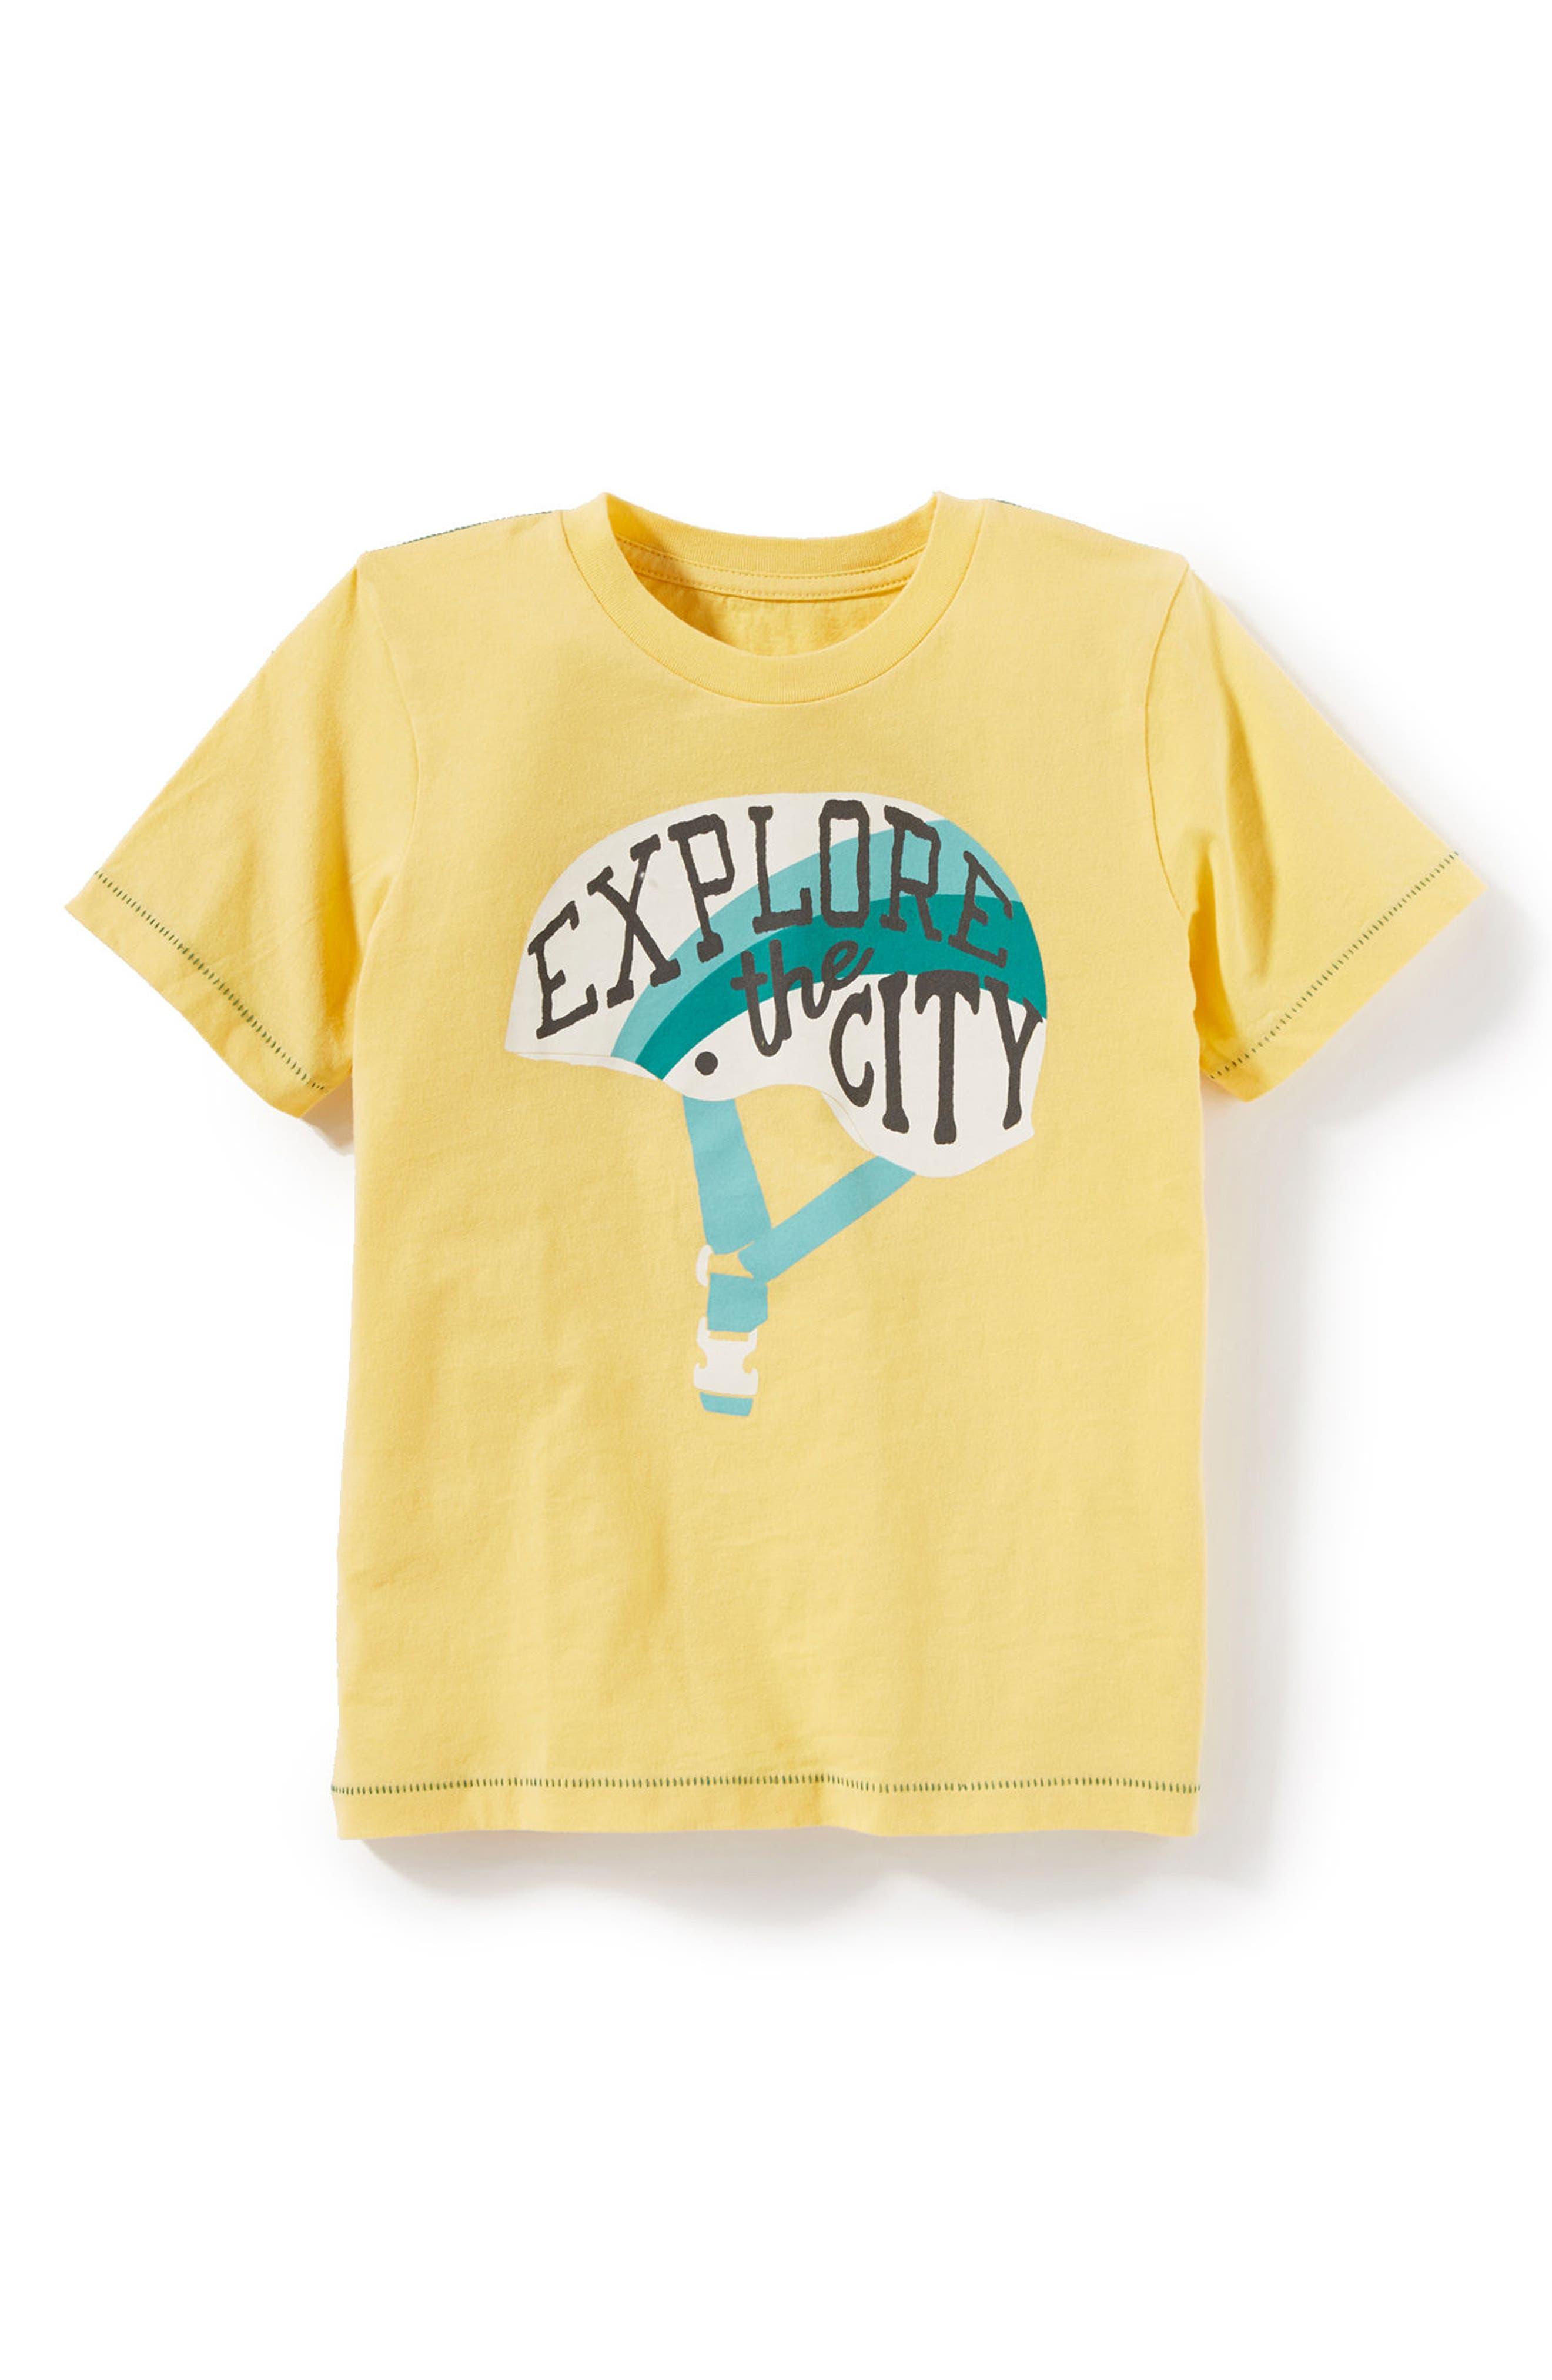 Alternate Image 1 Selected - Peek Explore the City Graphic T-Shirt (Toddler Boys, Little Boys & Big Boys)